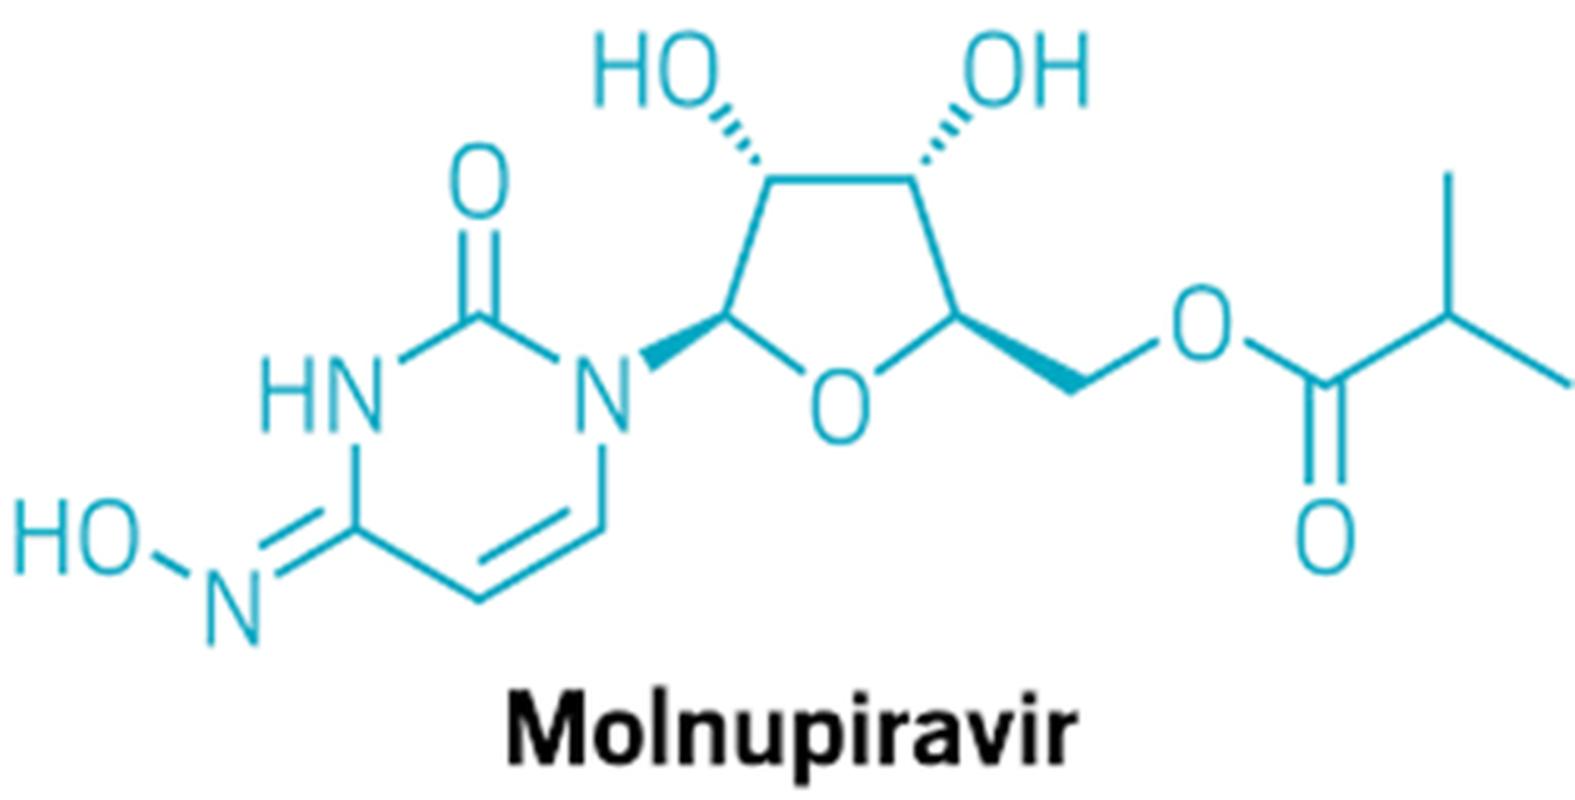 Tac dung thuoc Molnupiravir TP.HCM dung cho F0 dieu tri tai nha-Hinh-2